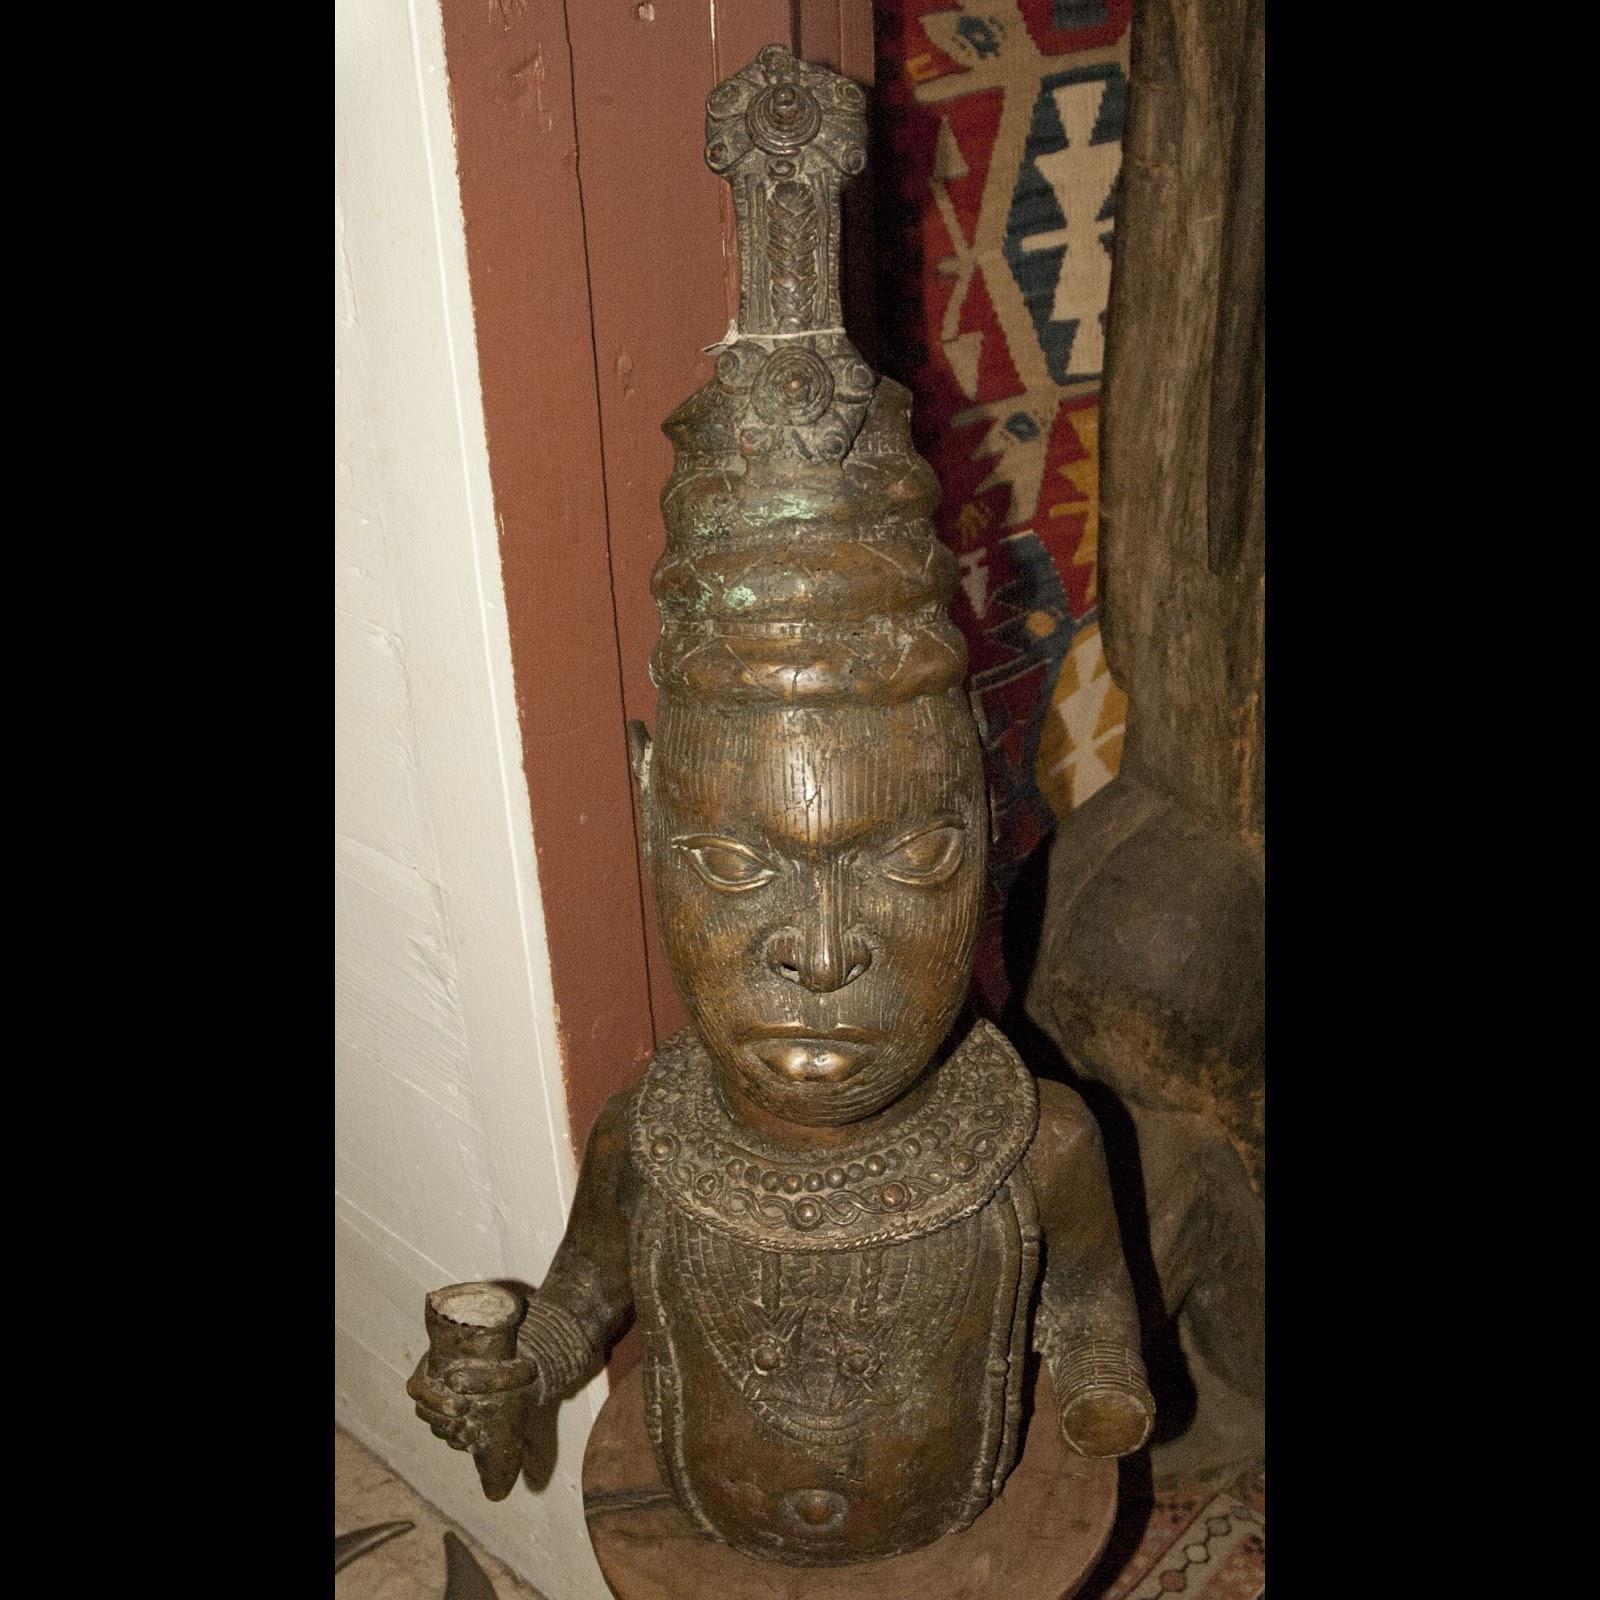 African Sculpture: The People's Blog: Yoruba And Benin Tribal Arts (part 1